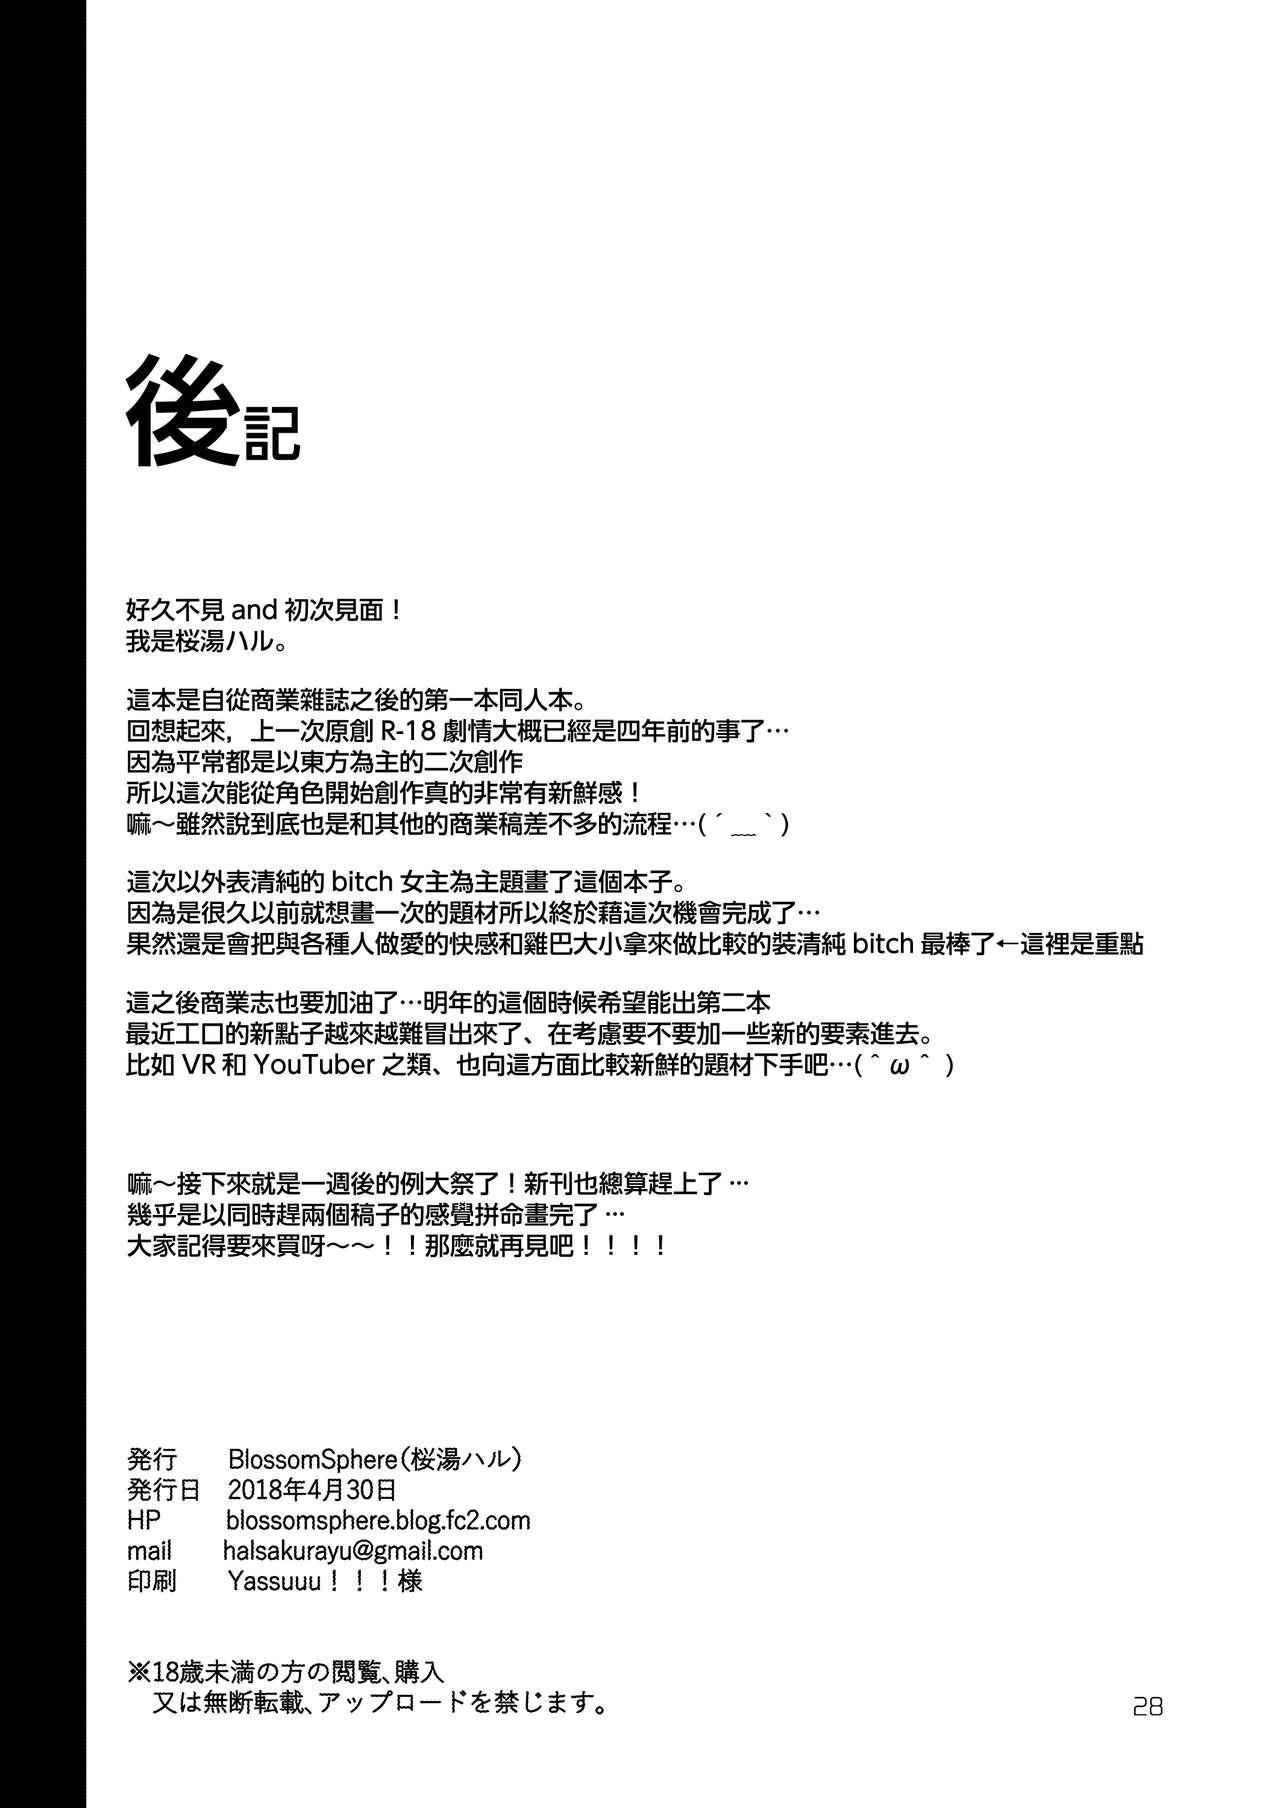 Seiso dakedo Bitch de Sex Daisuki Arimura-san. 28